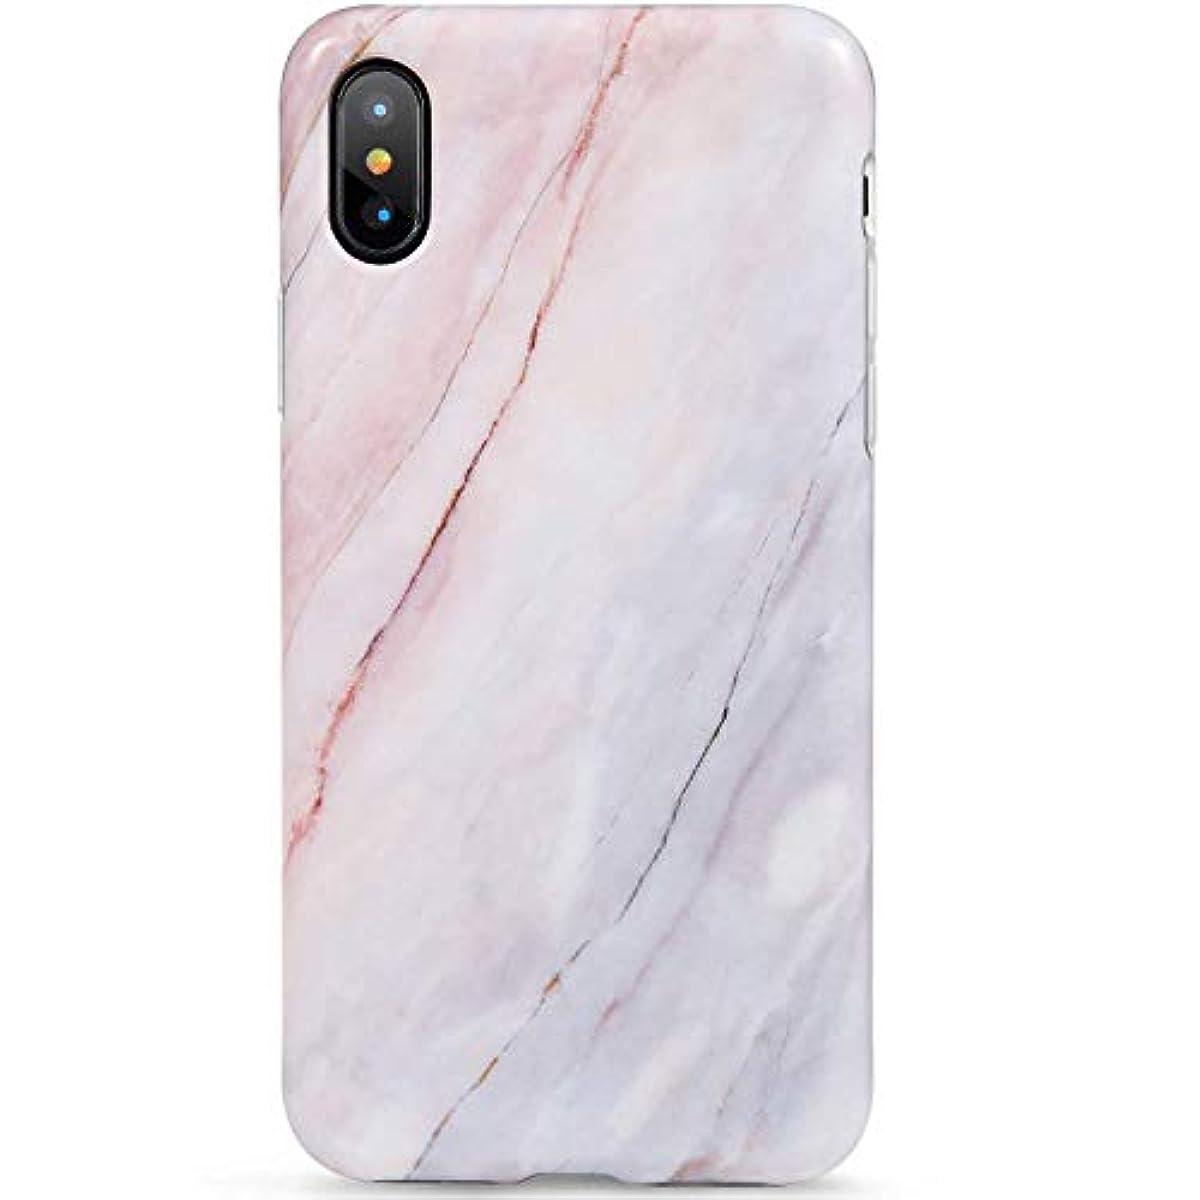 iphone xs max case matte